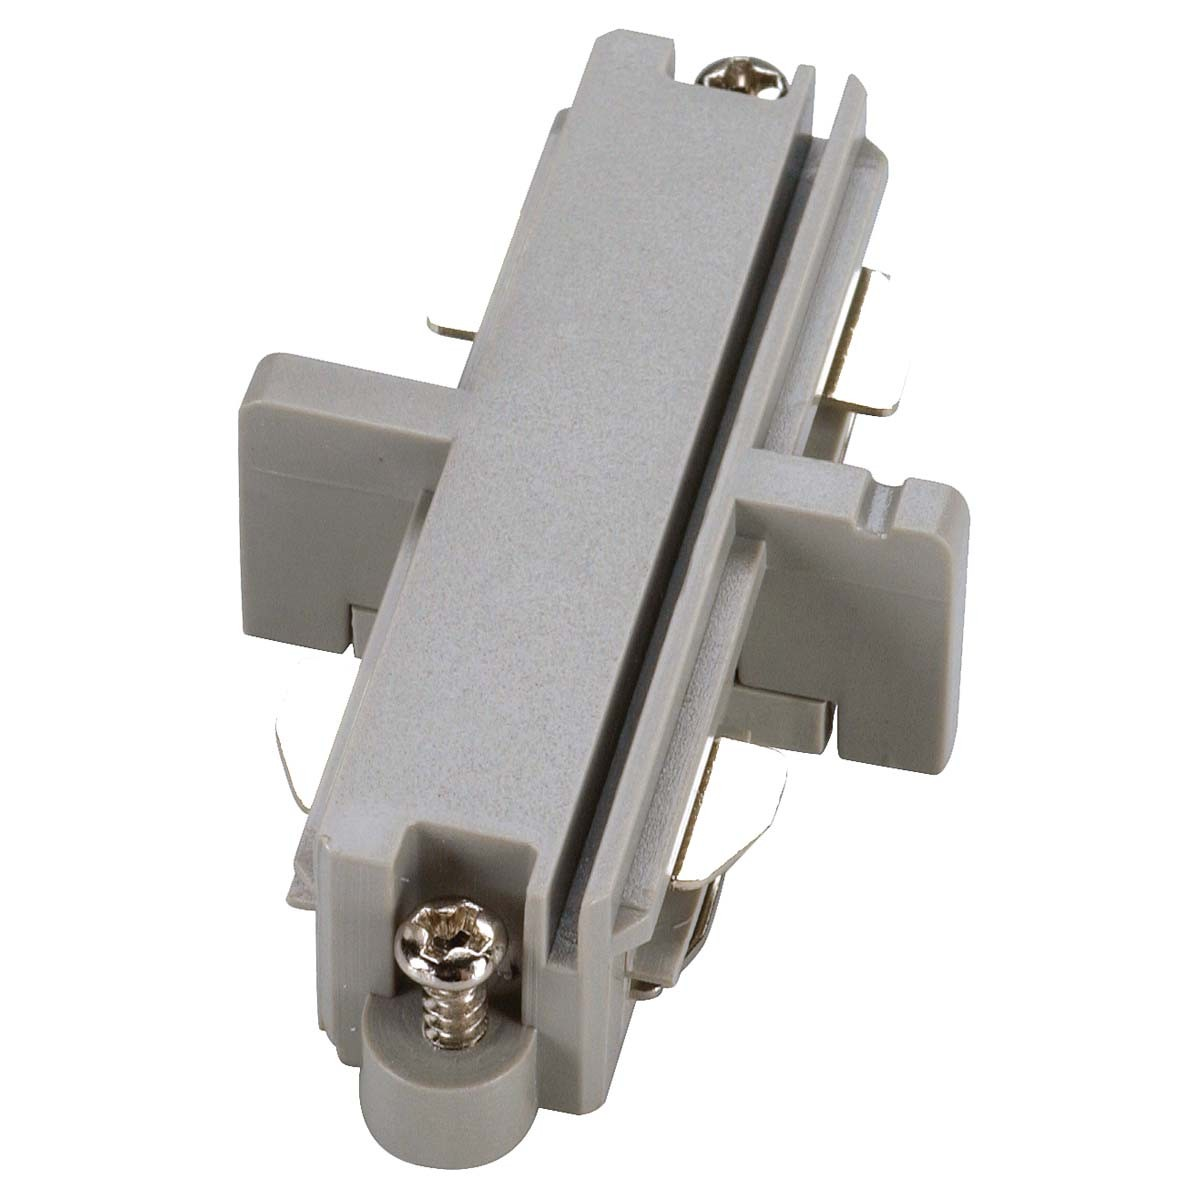 SLV 143092 Straight Coupler Silver Grey 1 Circuit 240V Track Accessory